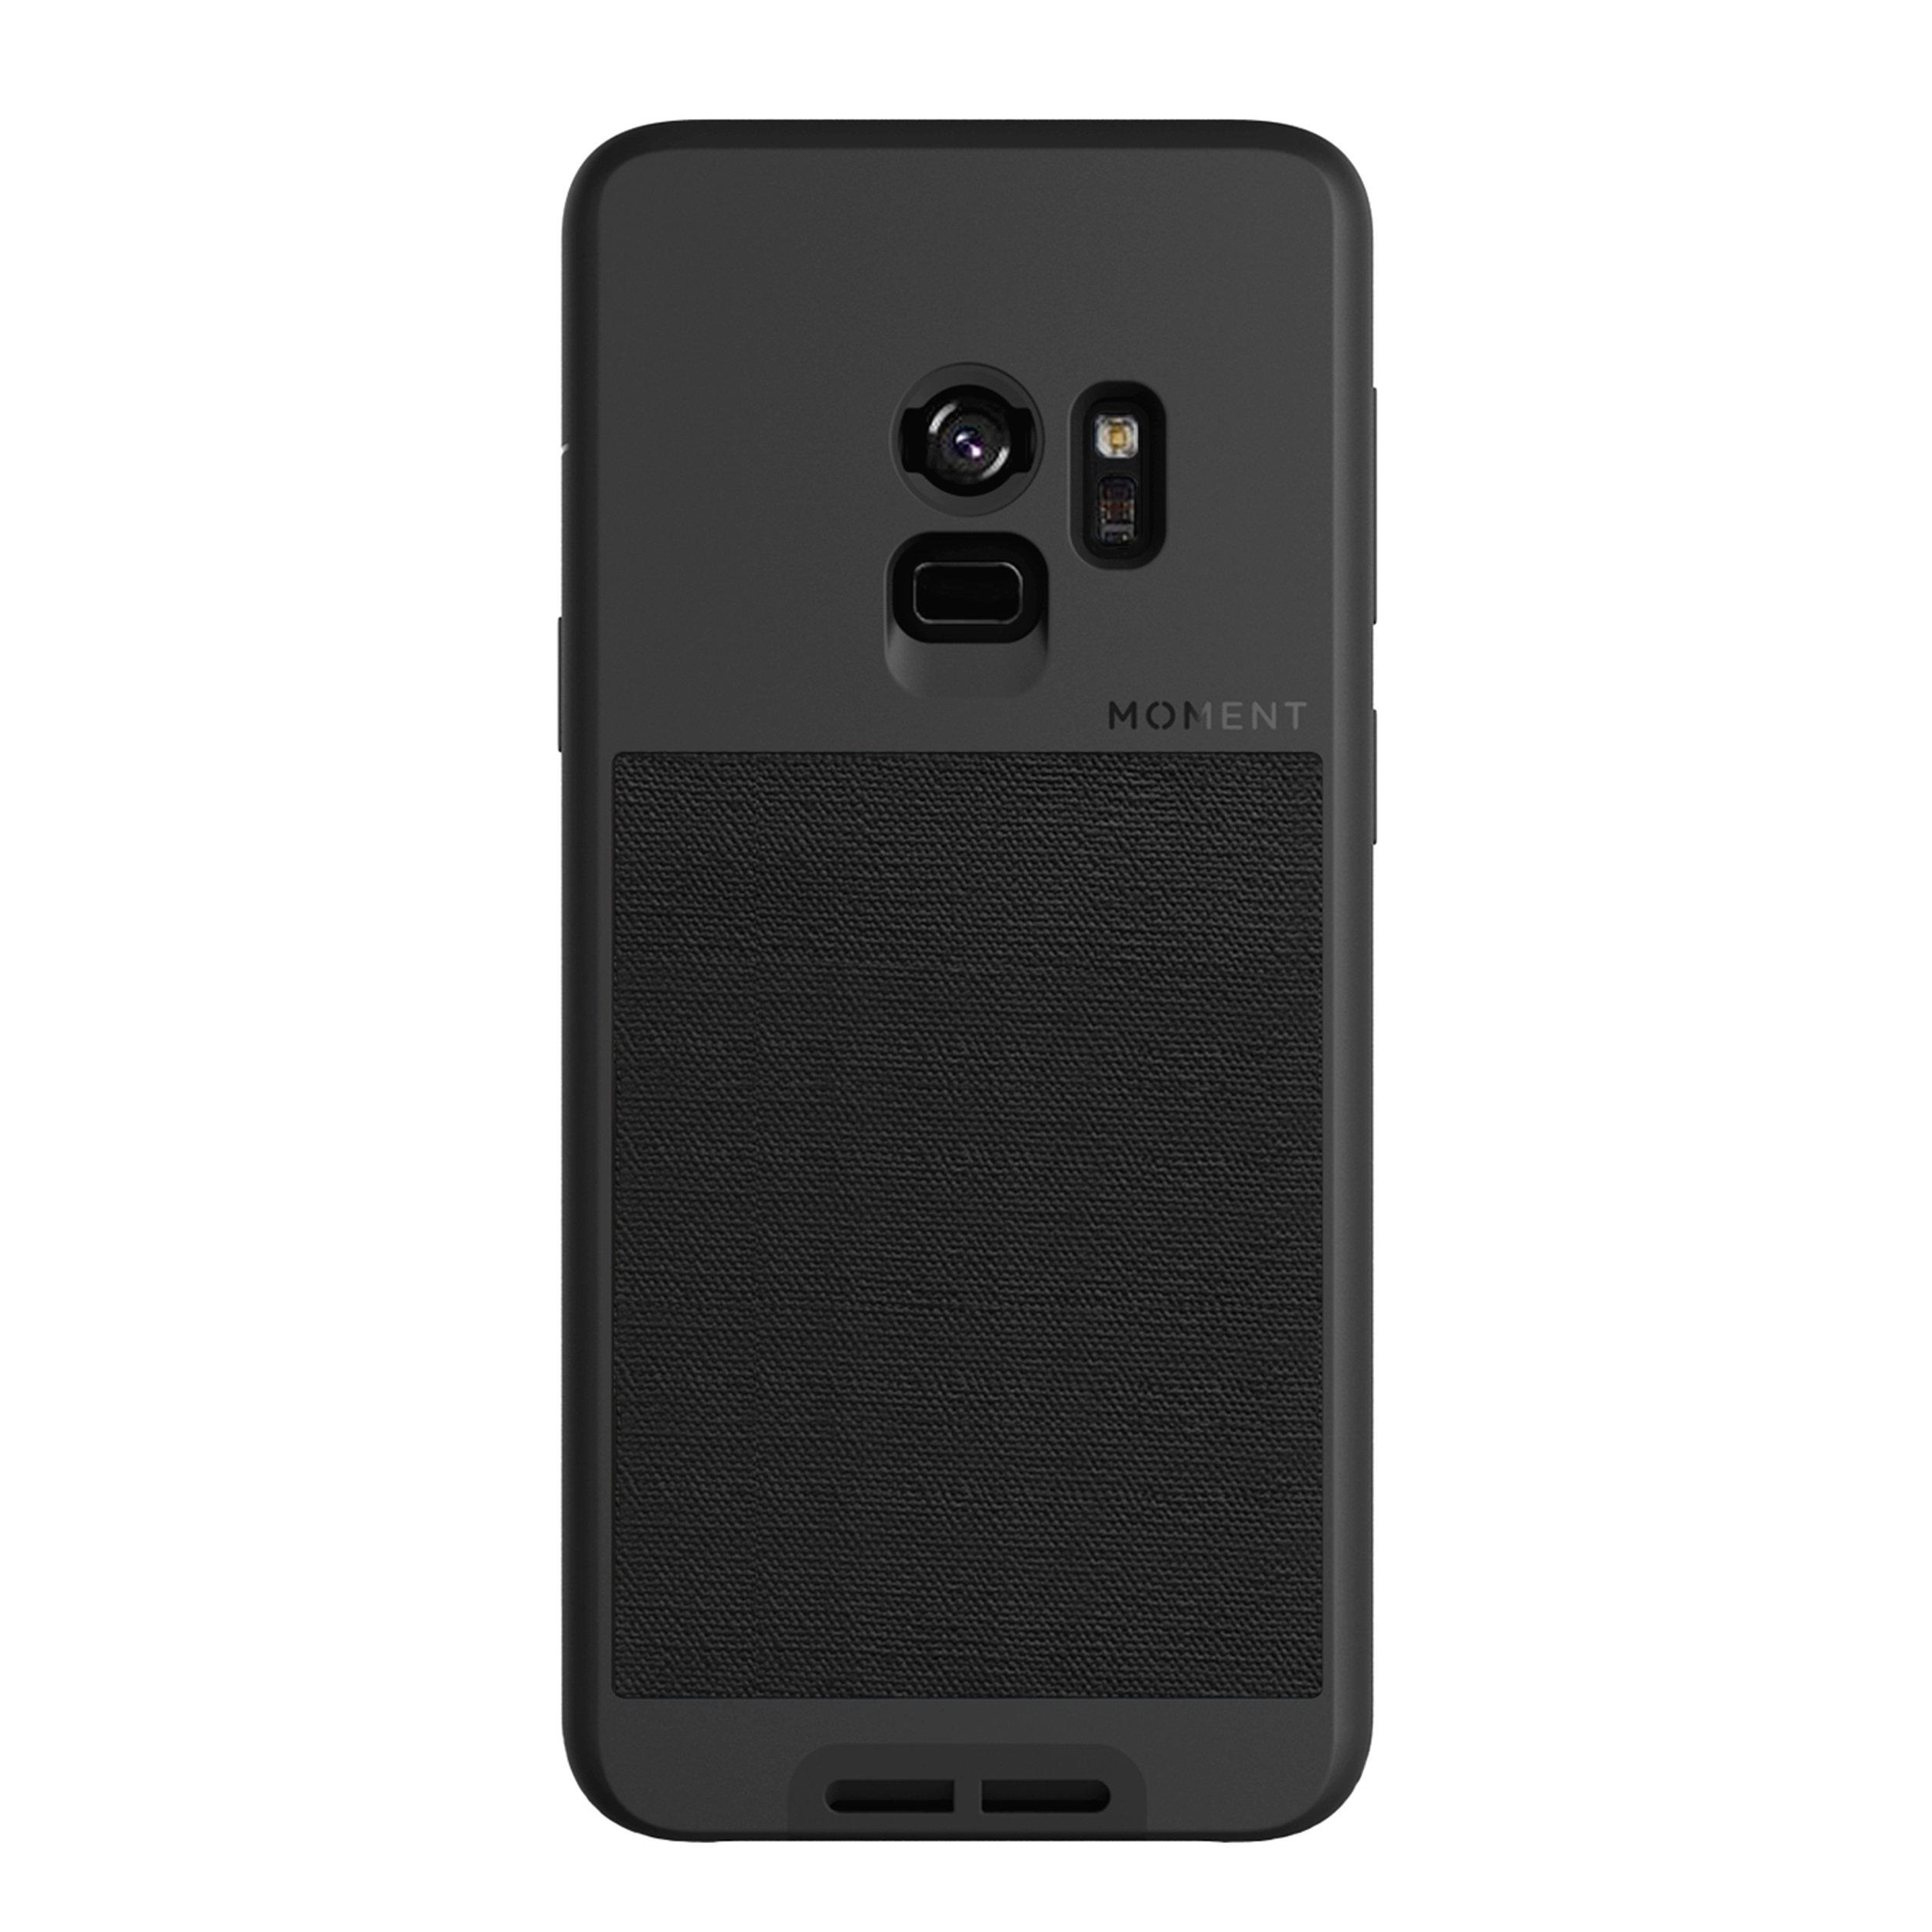 ویکالا · خرید  اصل اورجینال · خرید از آمازون · Galaxy S9 Case || Moment Photo Case in Black Canvas - Thin, Protective, Wrist Strap Friendly case for Camera Lovers. wekala · ویکالا